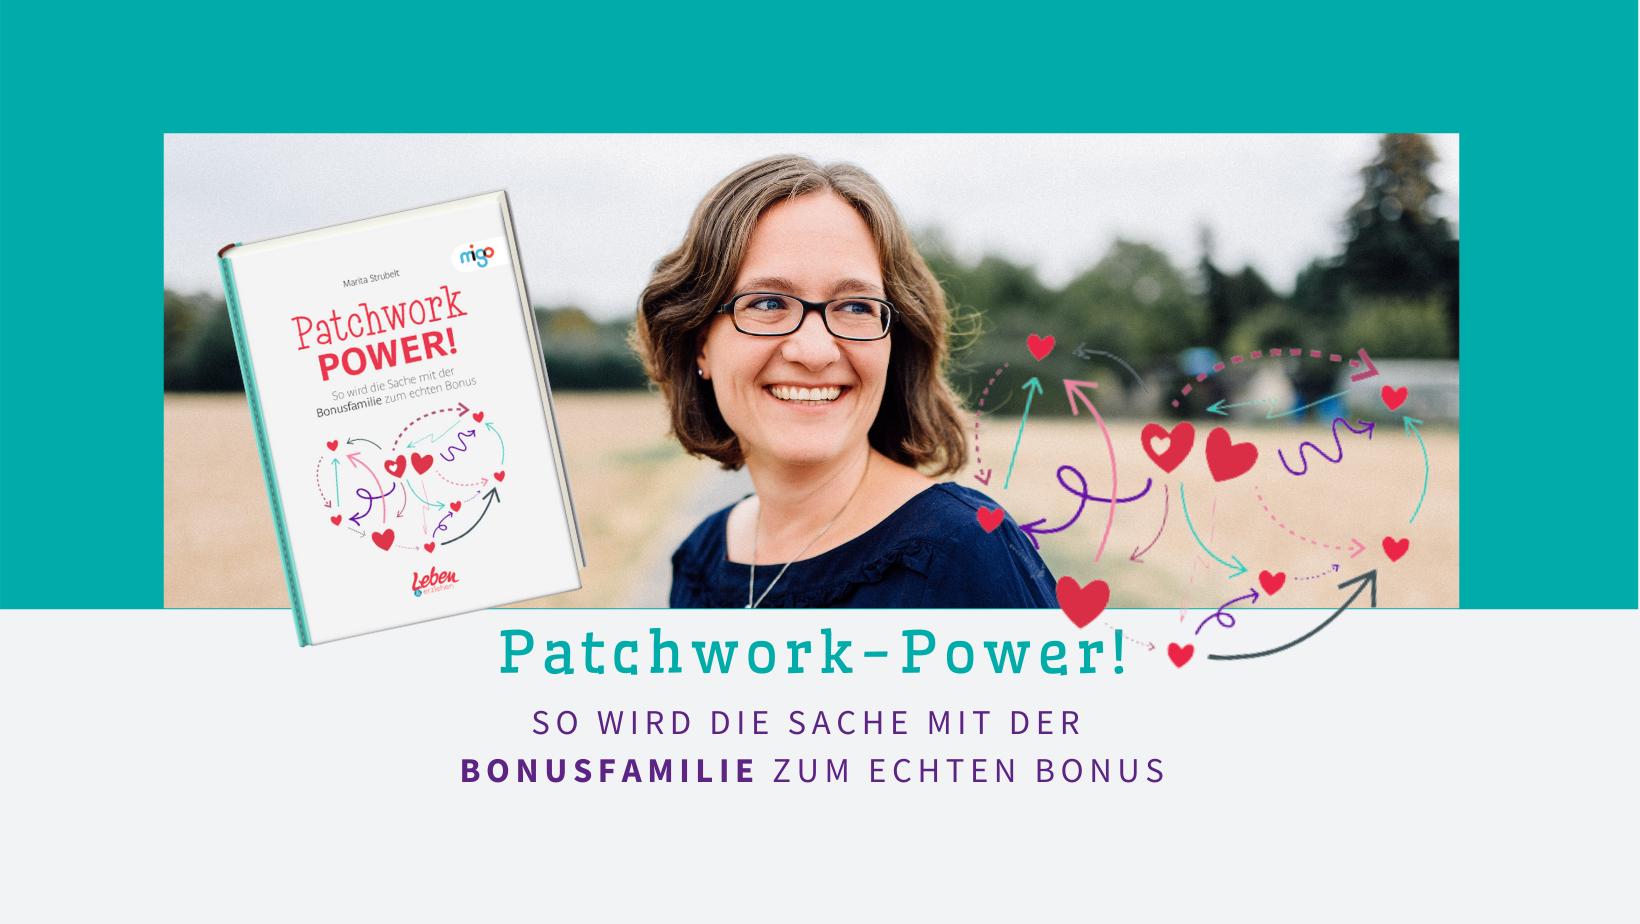 Marita Strubelt - Patchwork Power! Talk